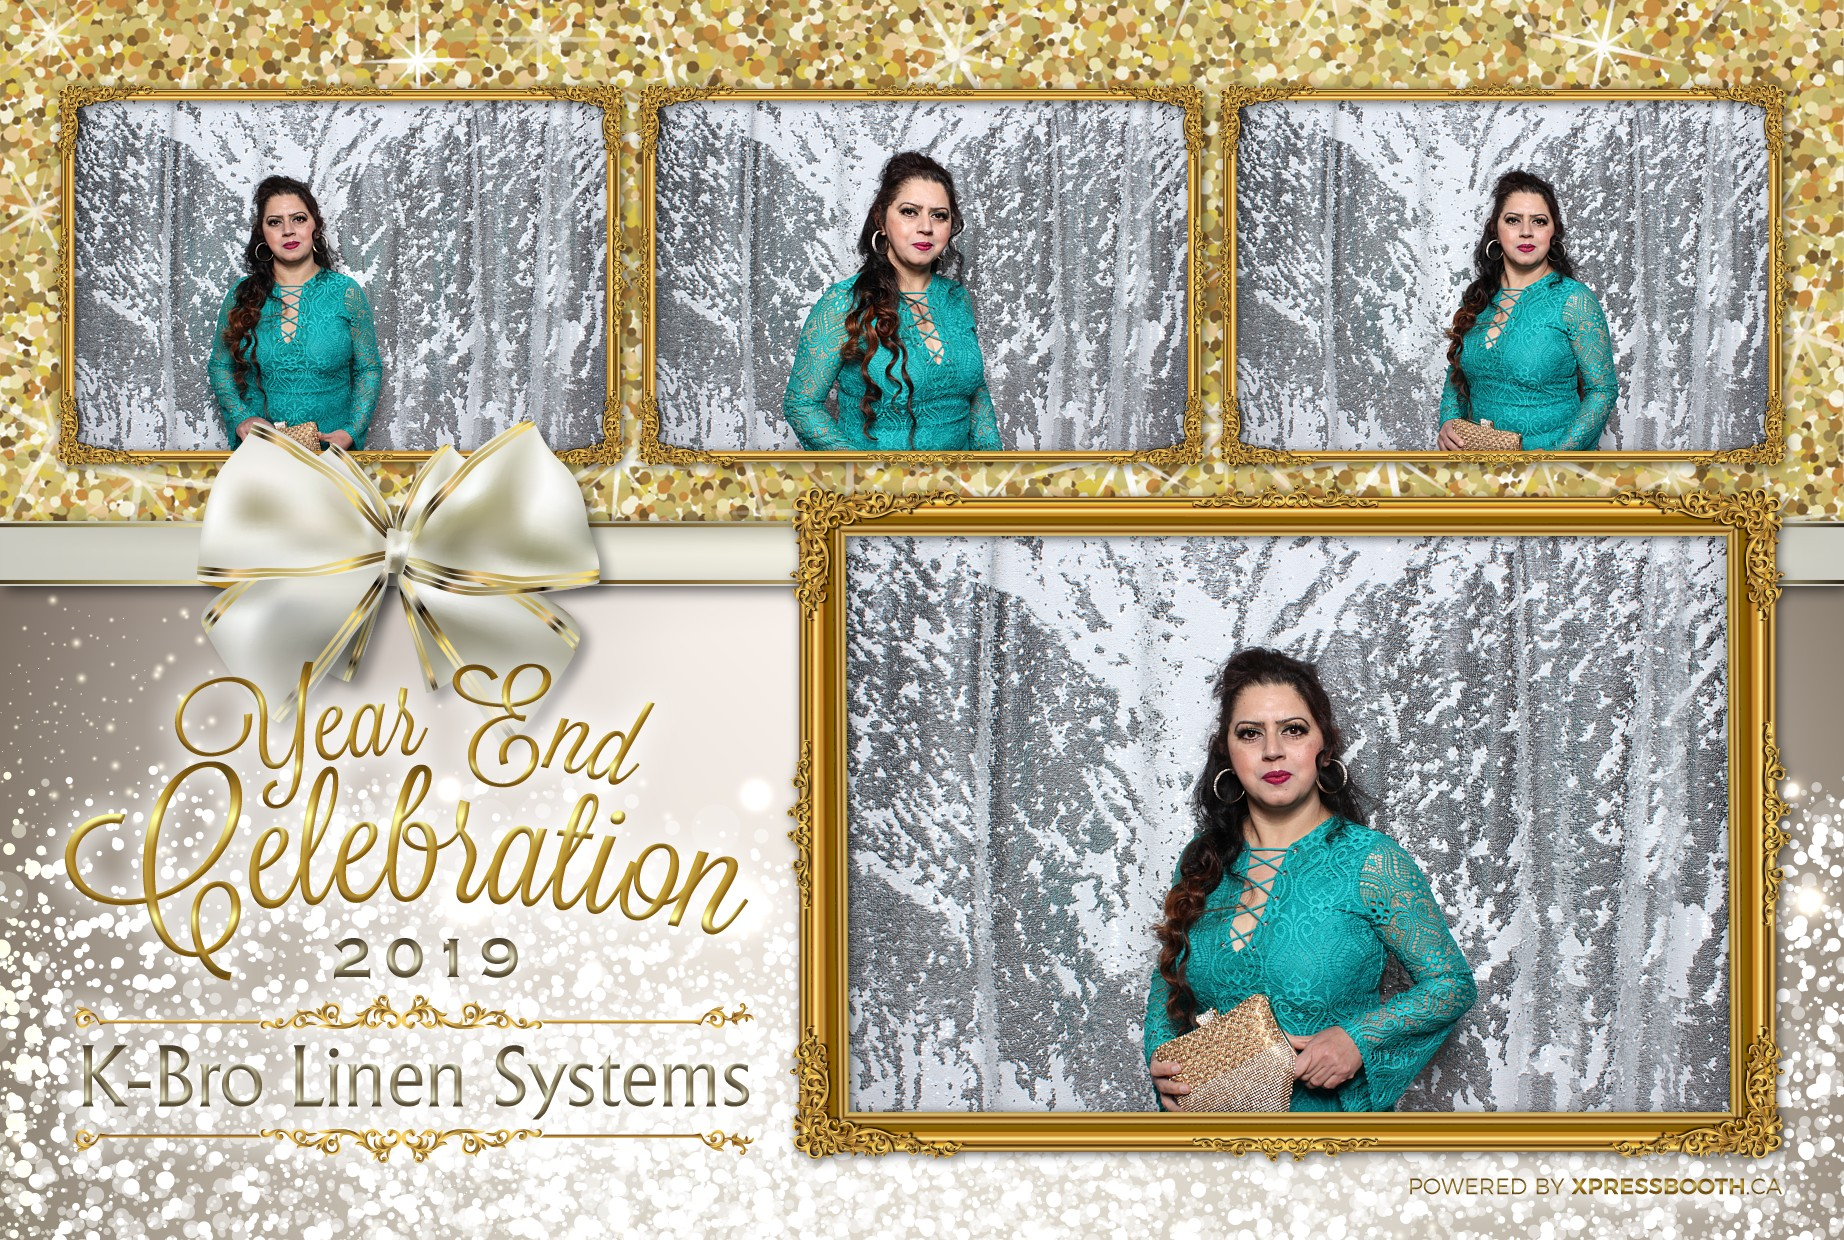 KBroLinenSystems2019-0221-PRINT